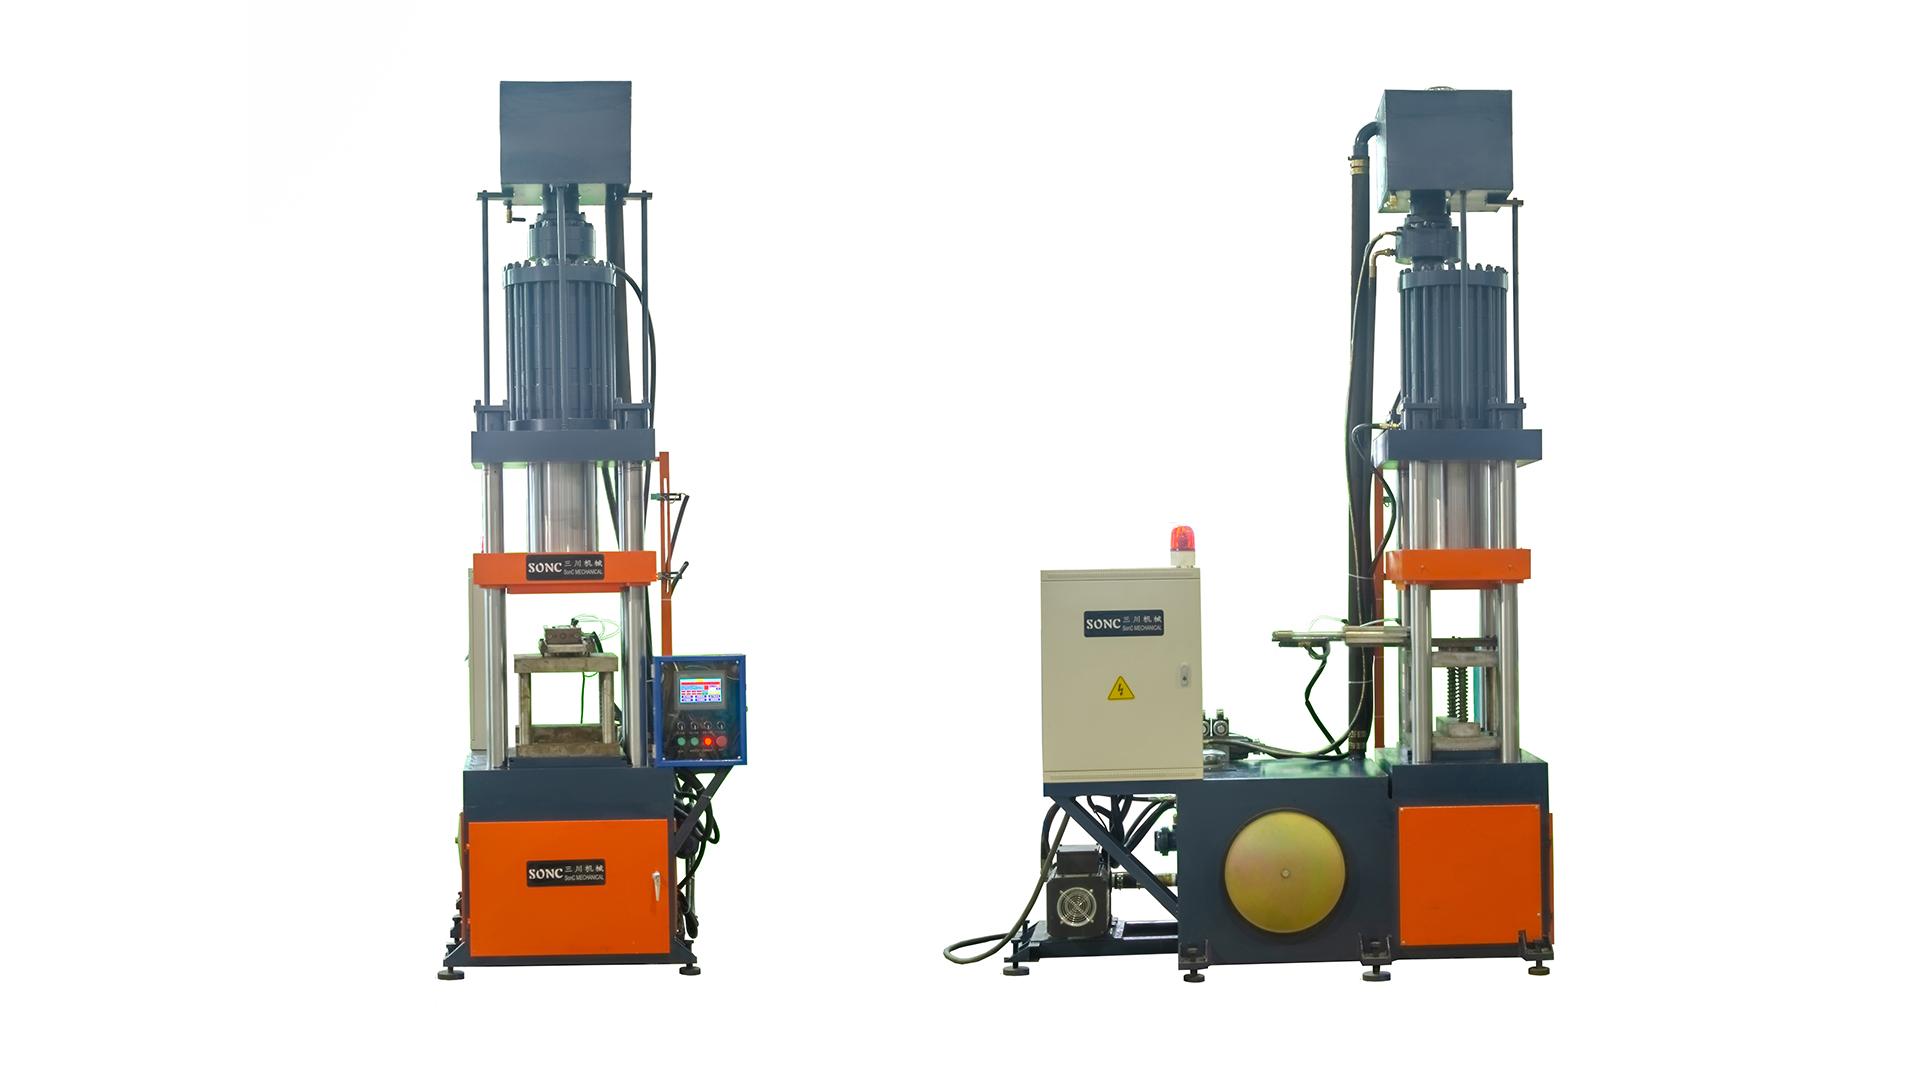 Wholesale Metal Powder Metallurgy Press Machine ZA1 series ZL101 with good price-SONC